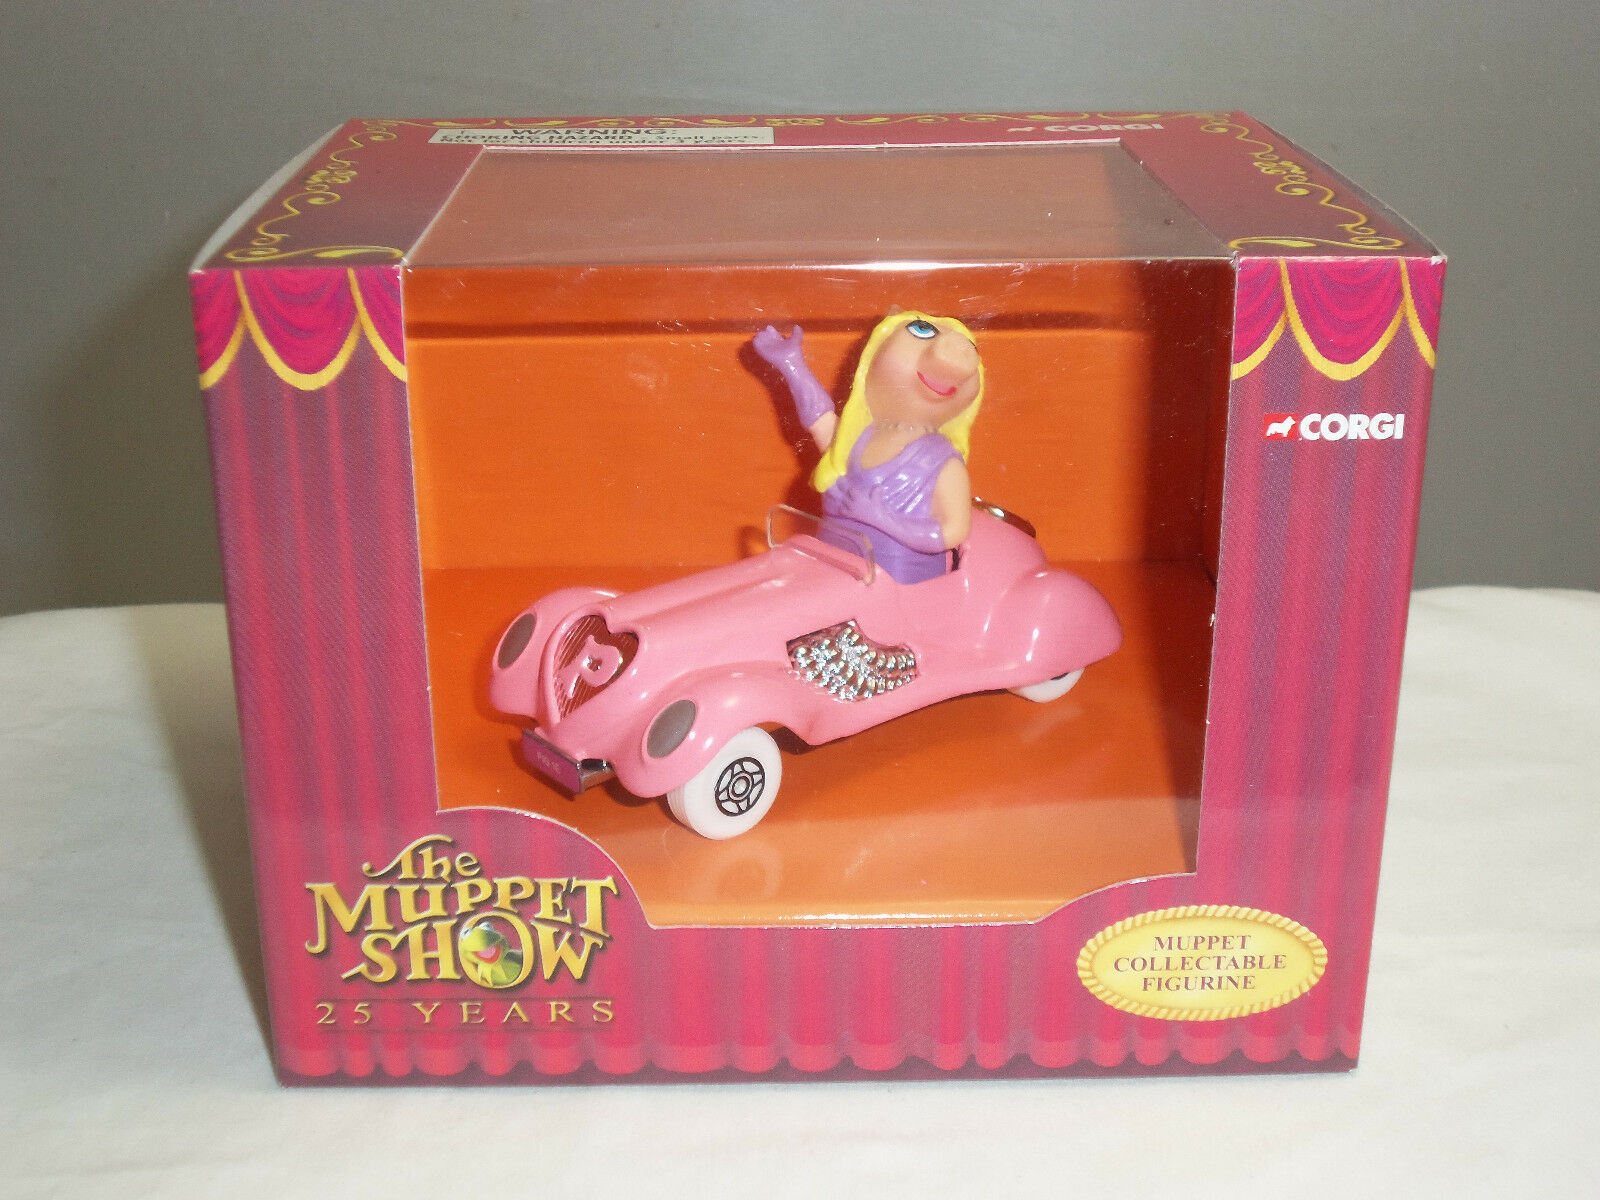 Corgi cc06603 jim henson muppets miss piggy - figur ein diecast modell Rosa auto